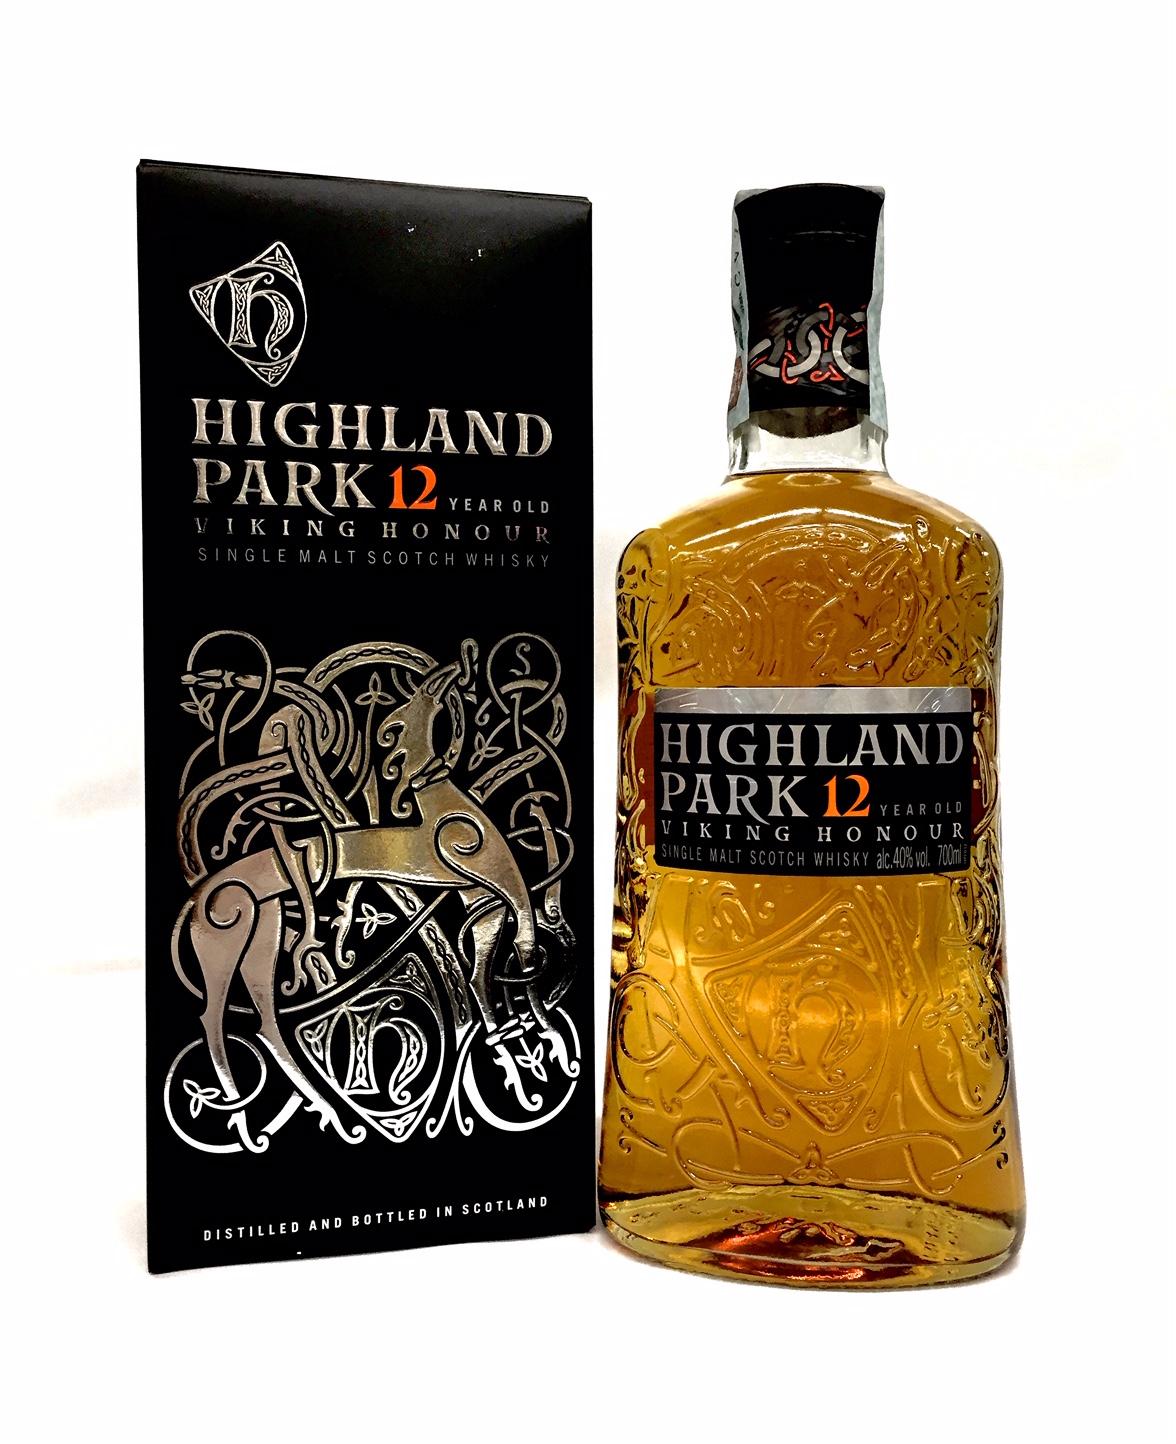 Whisky Highland Park 12 anni - Orkney - Scozia